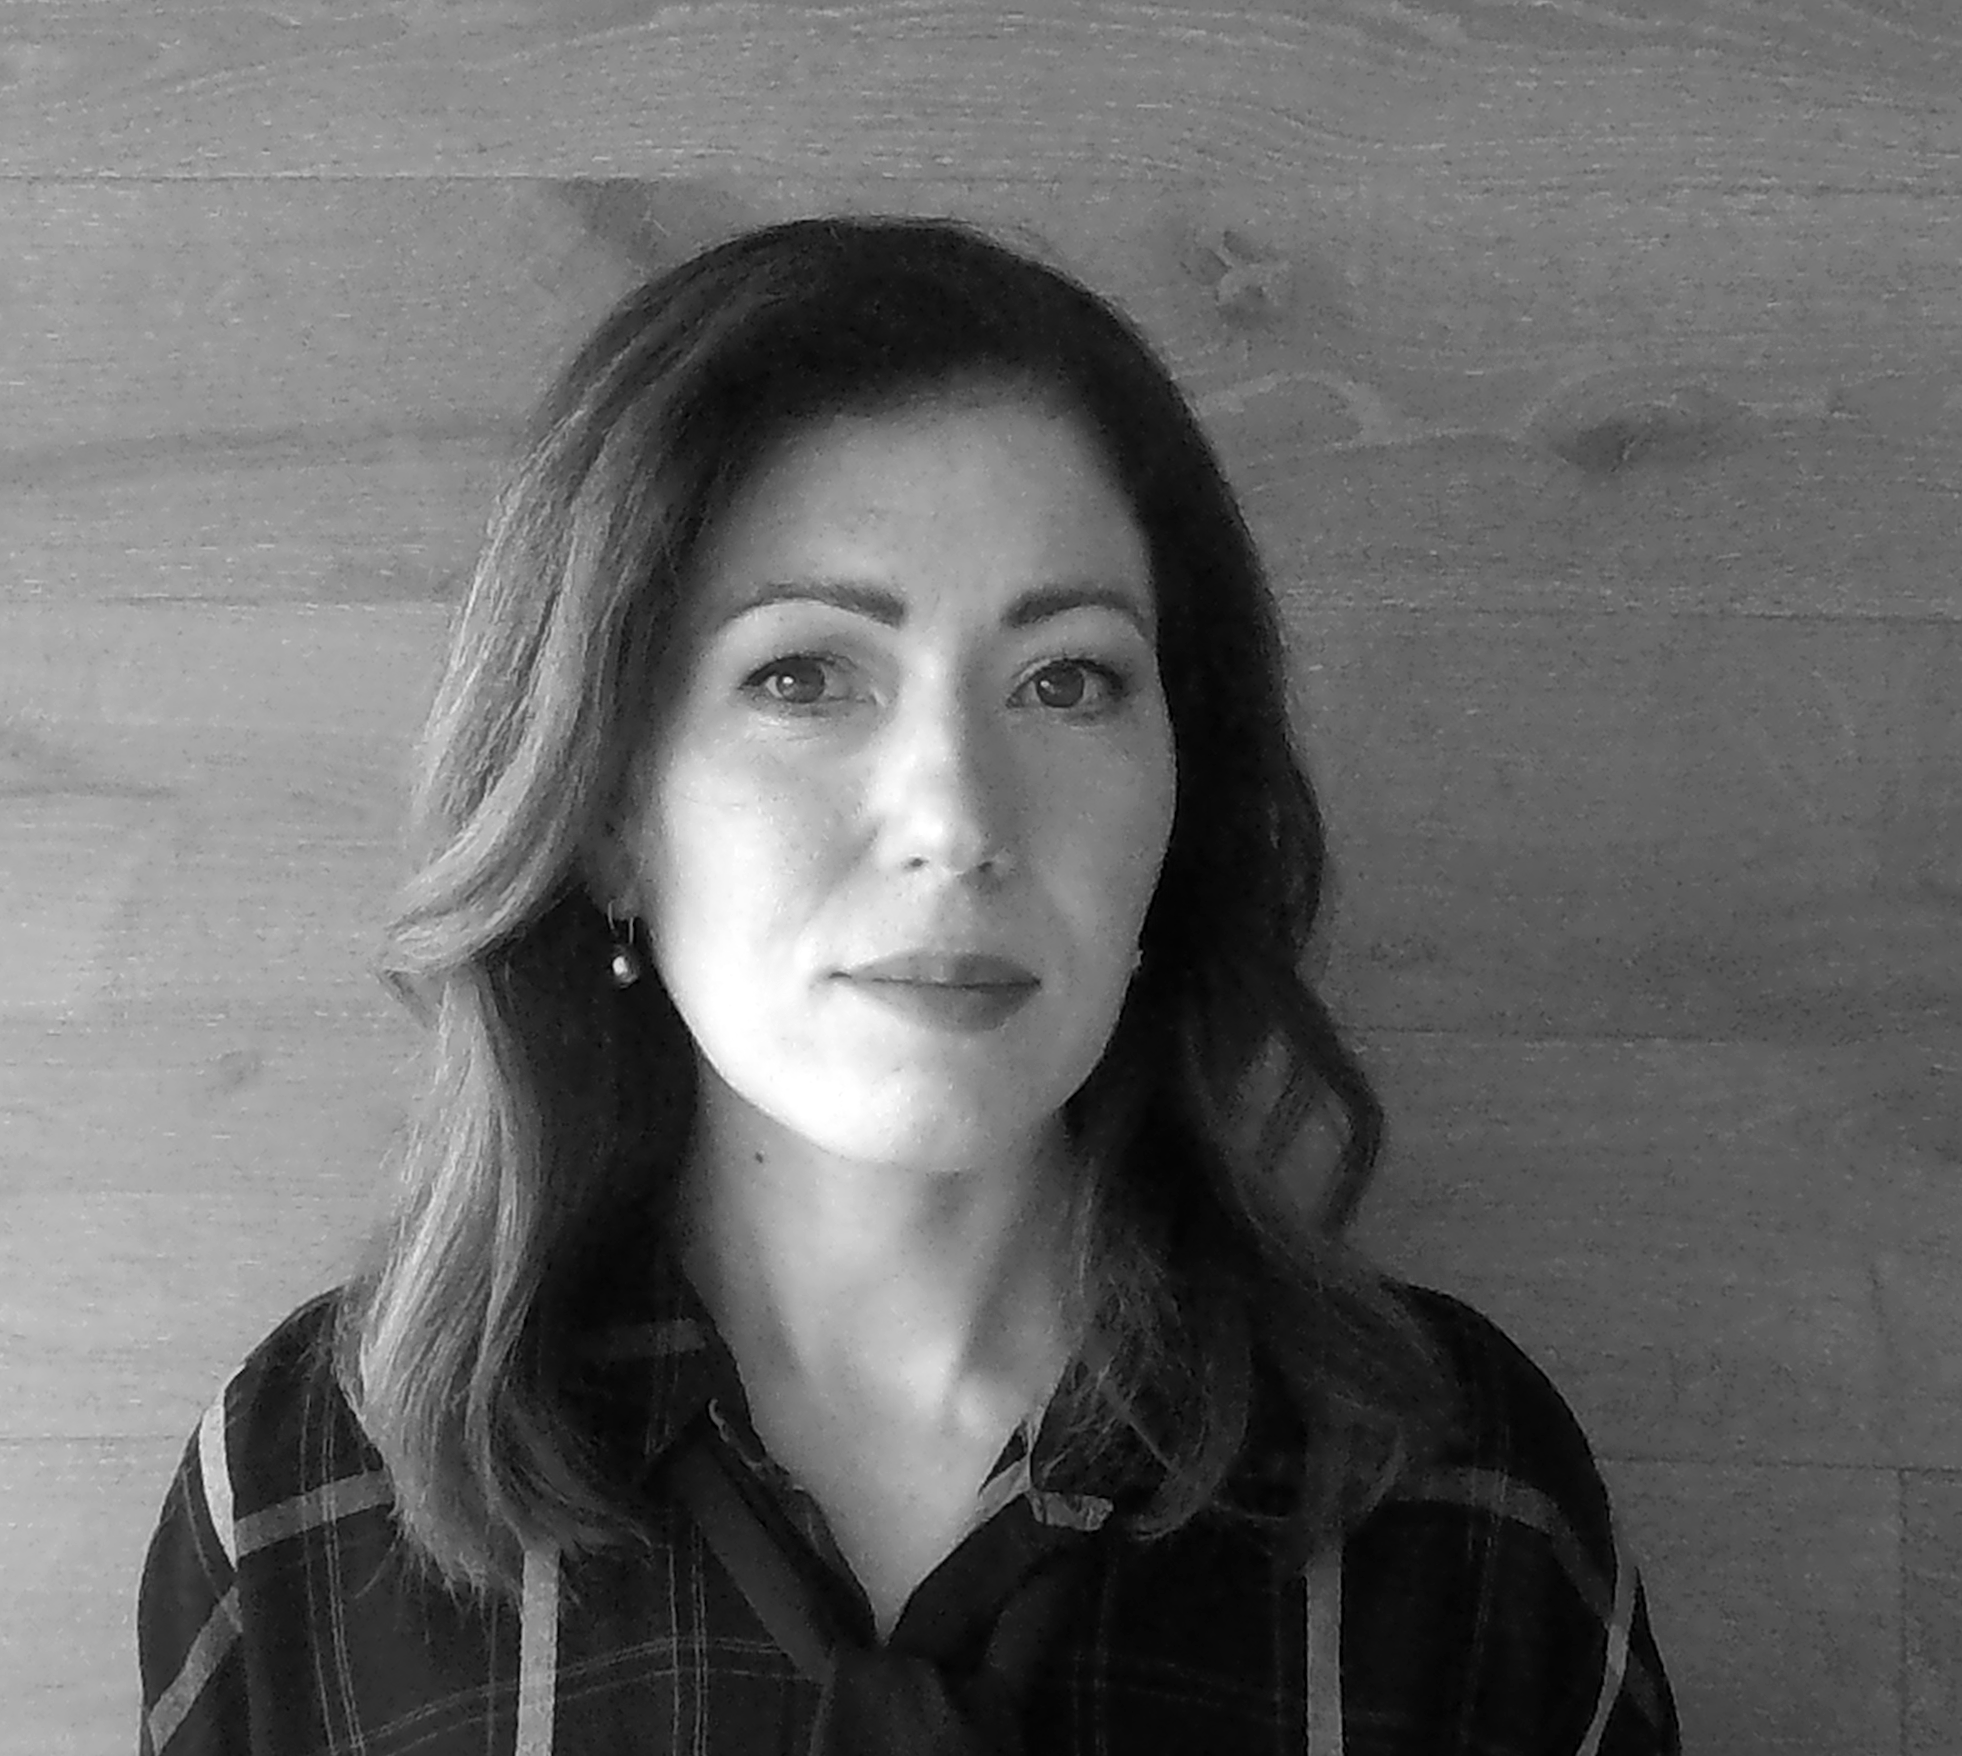 Veronika Jasina, Revit ivadiniai mokymai kursai